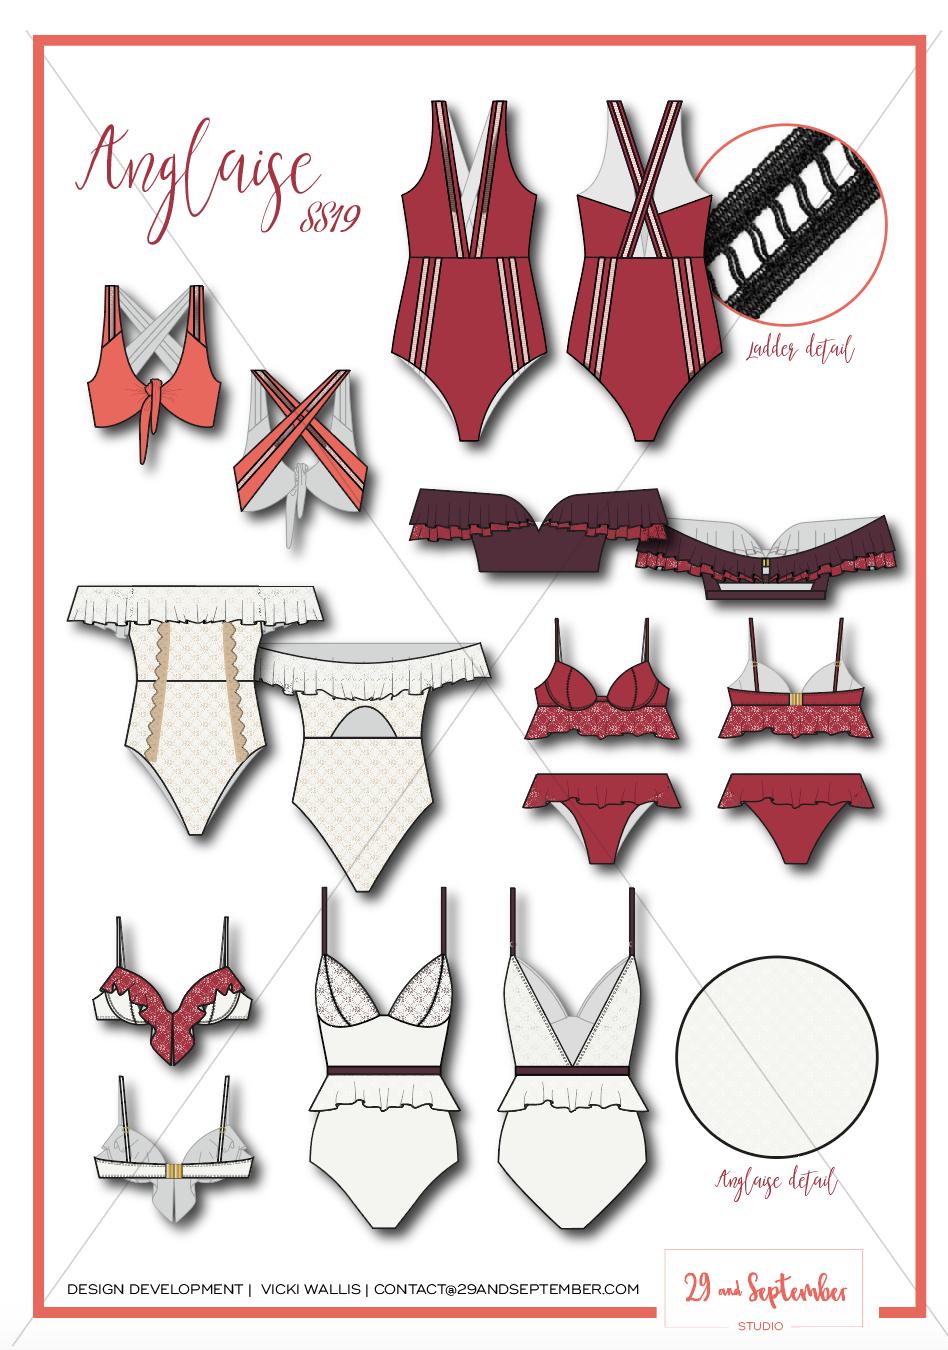 Swimwear inspiration | technical drawings for swimwear